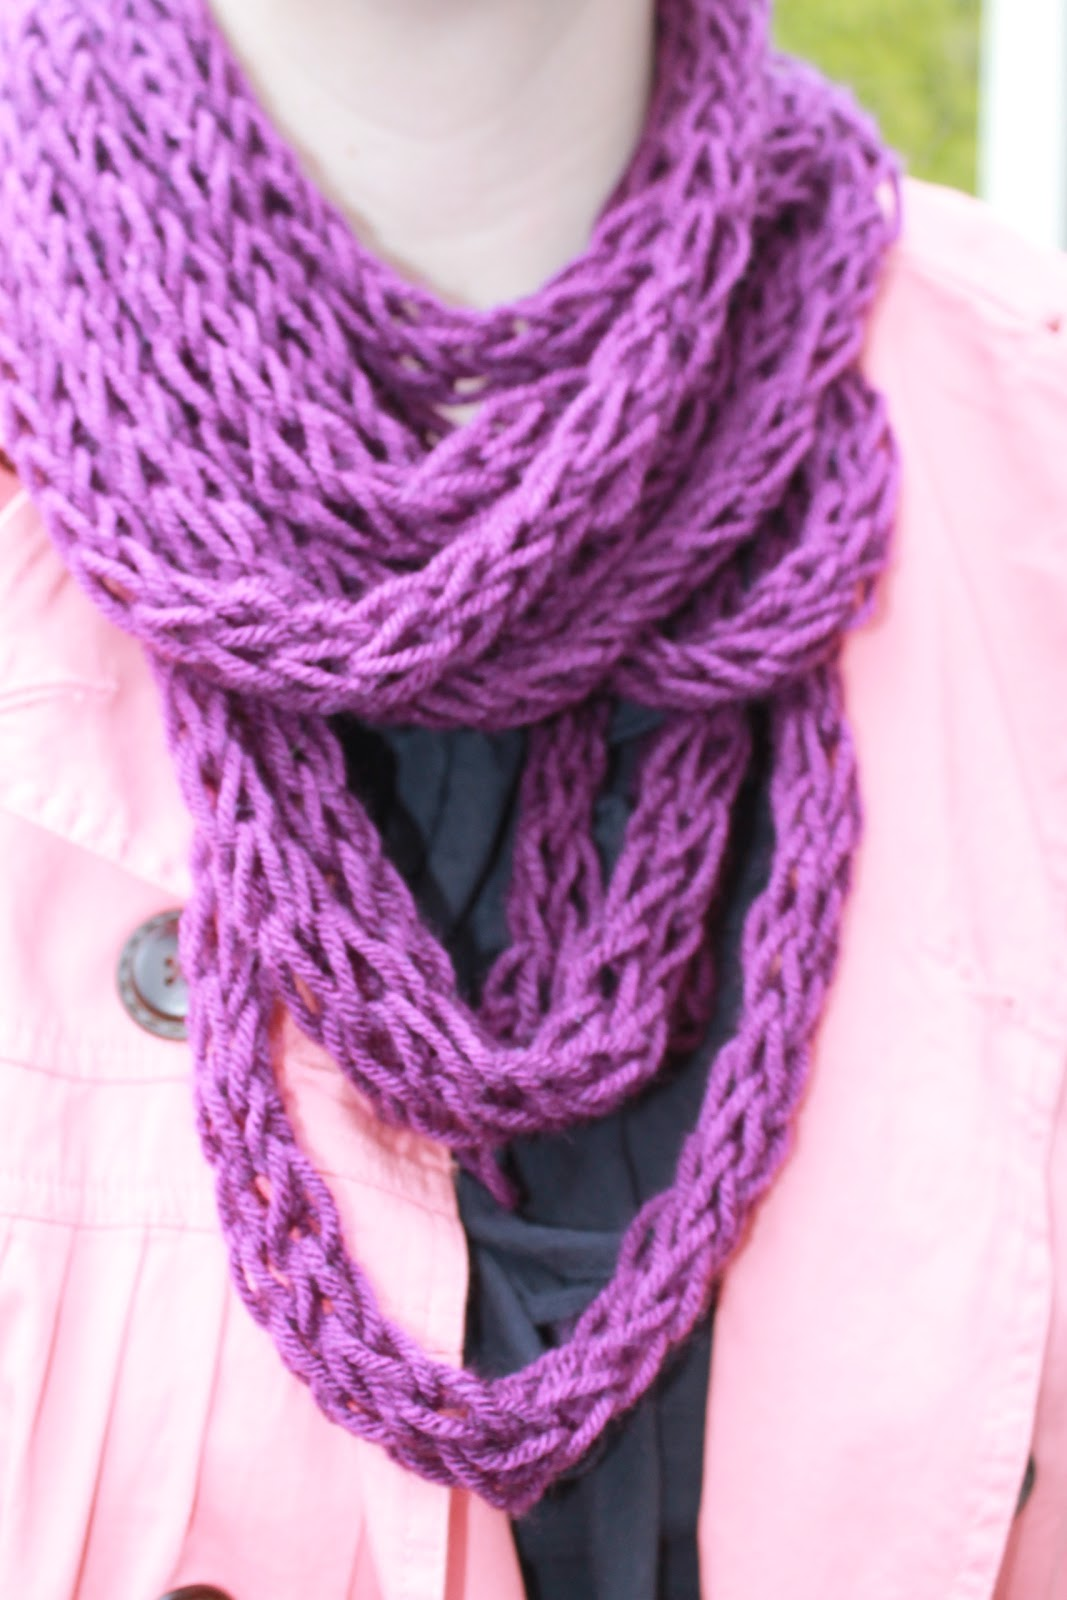 Finger Knitting Uses : Seeking eco chic finger knitting diy scarf